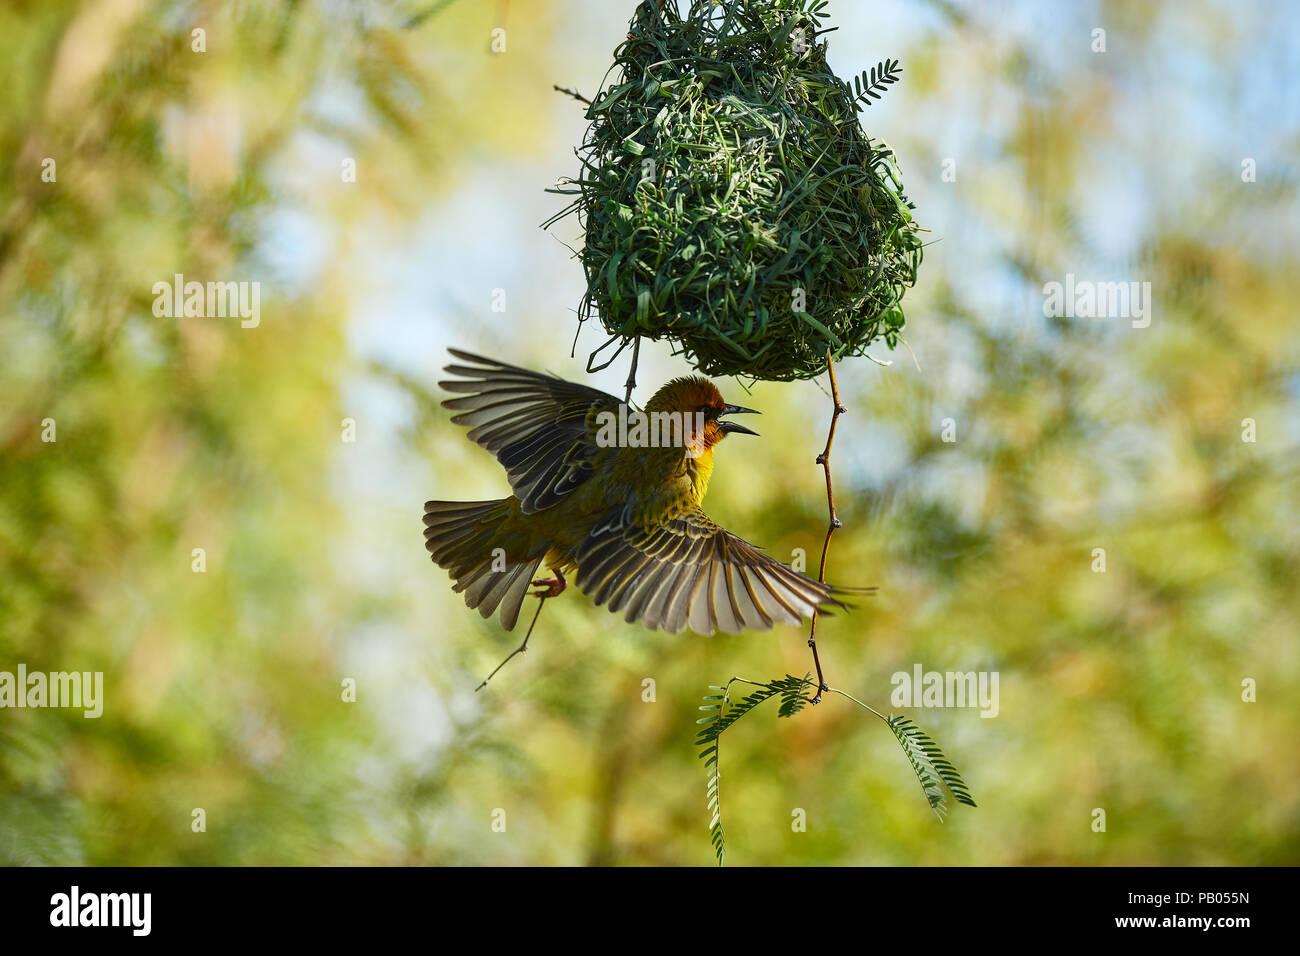 Cape Weaver bird in Camel Thorn tree - Stock Image